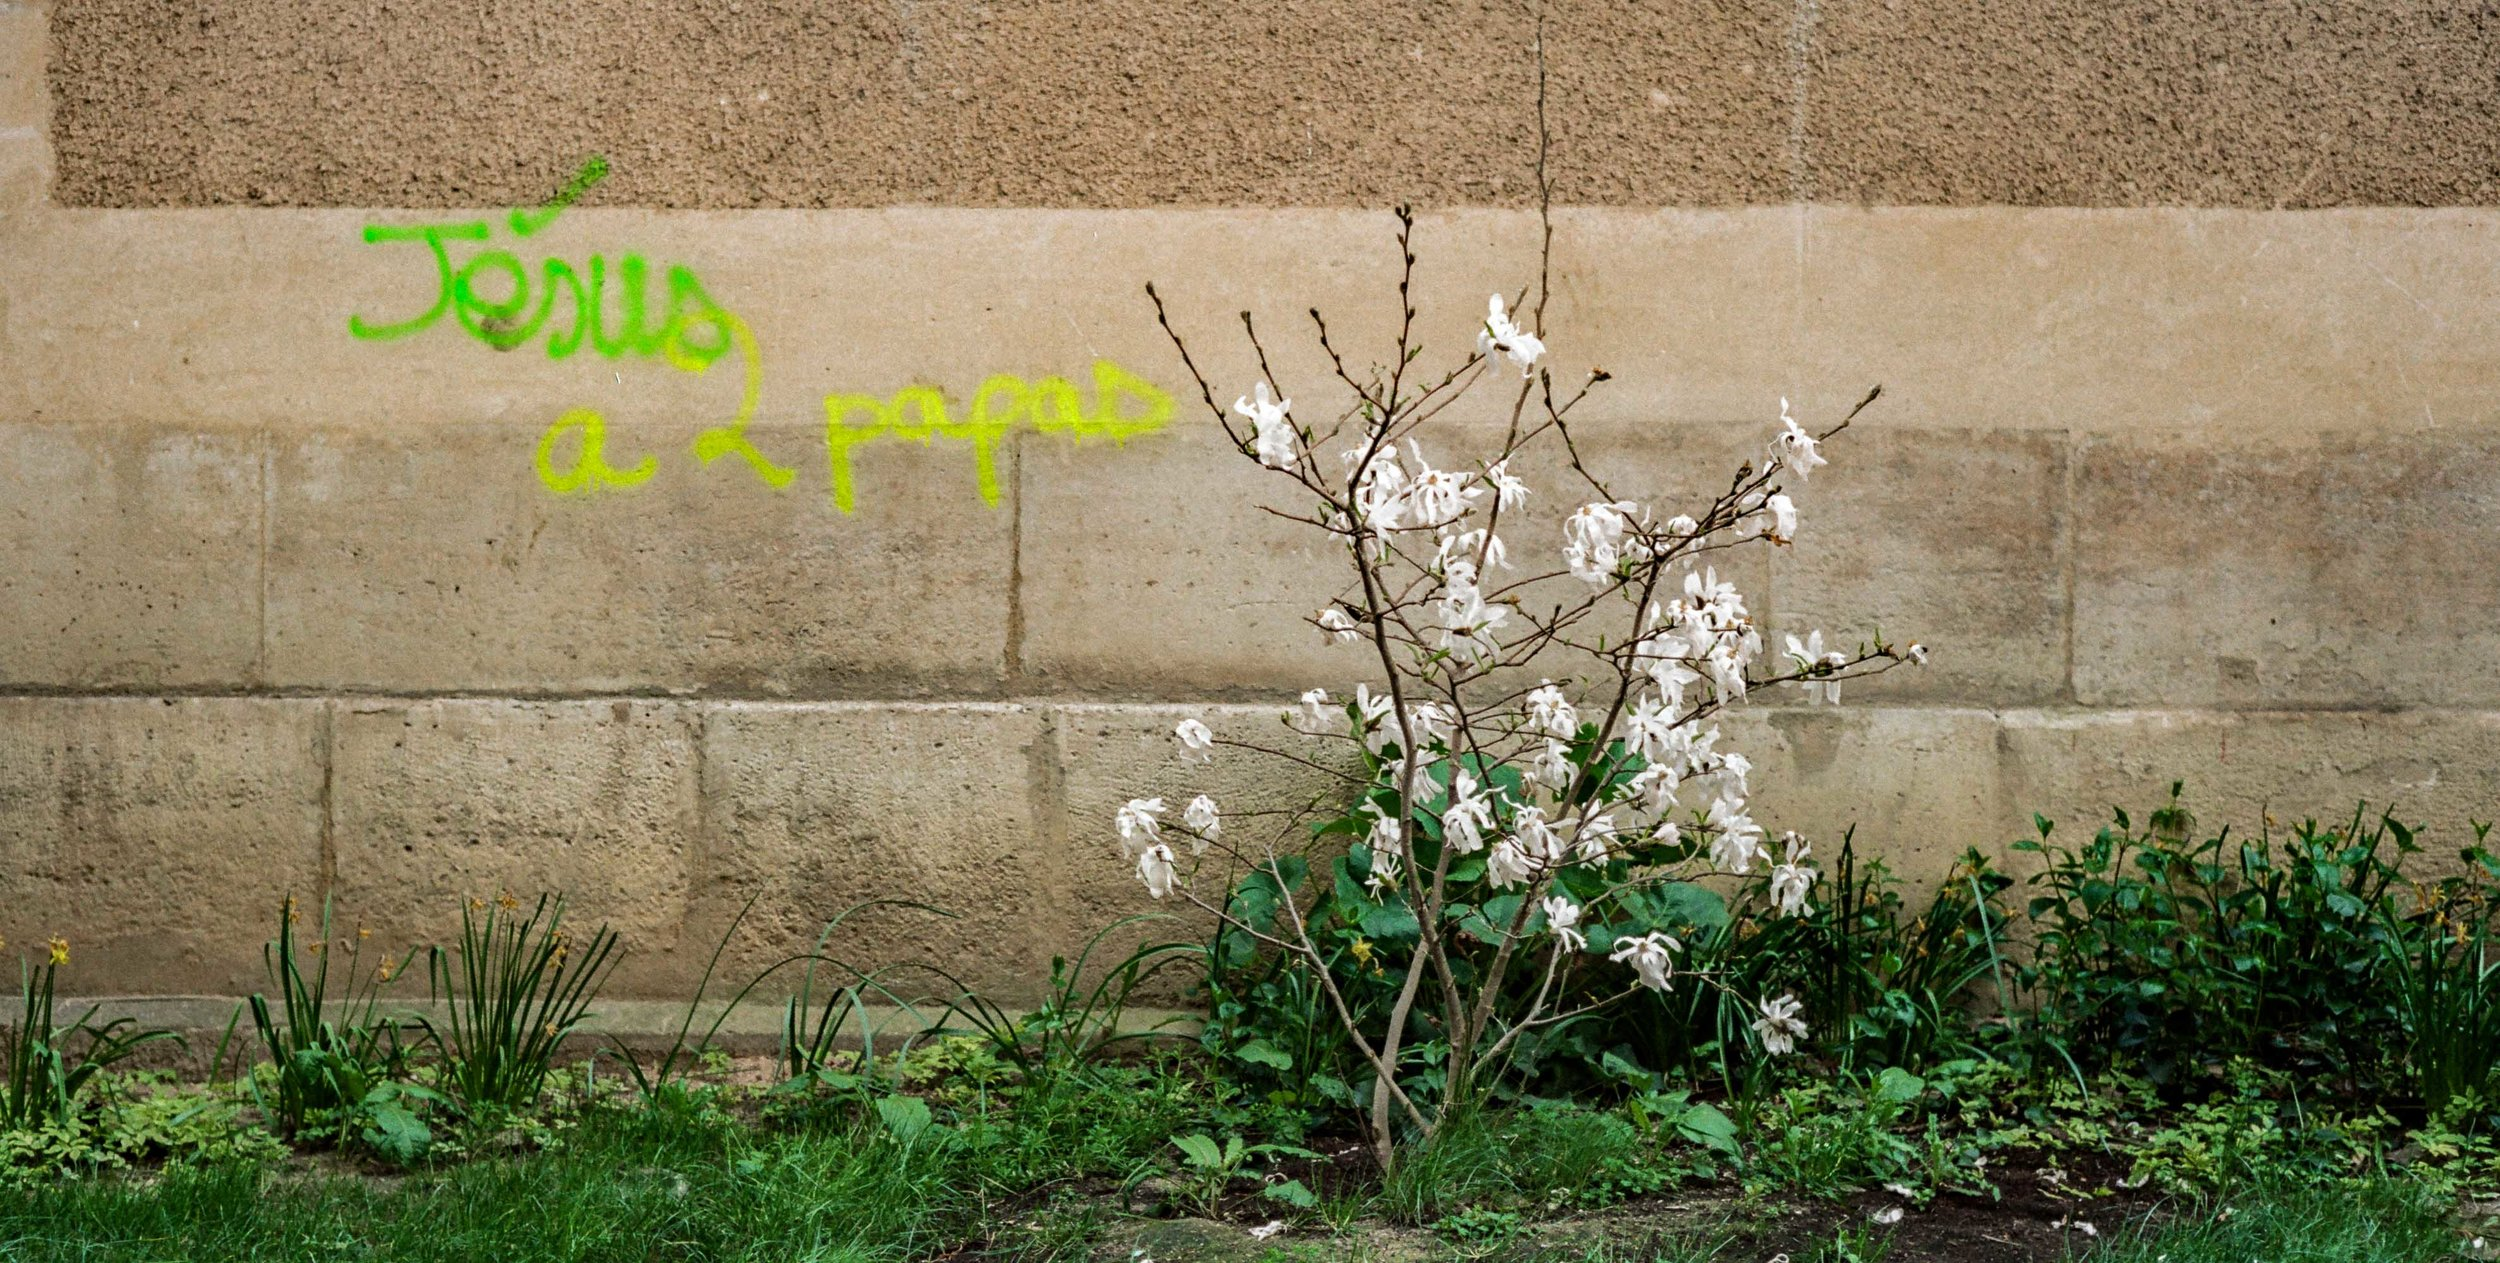 Mitchell Sturm - France 19.04.19-41.jpg